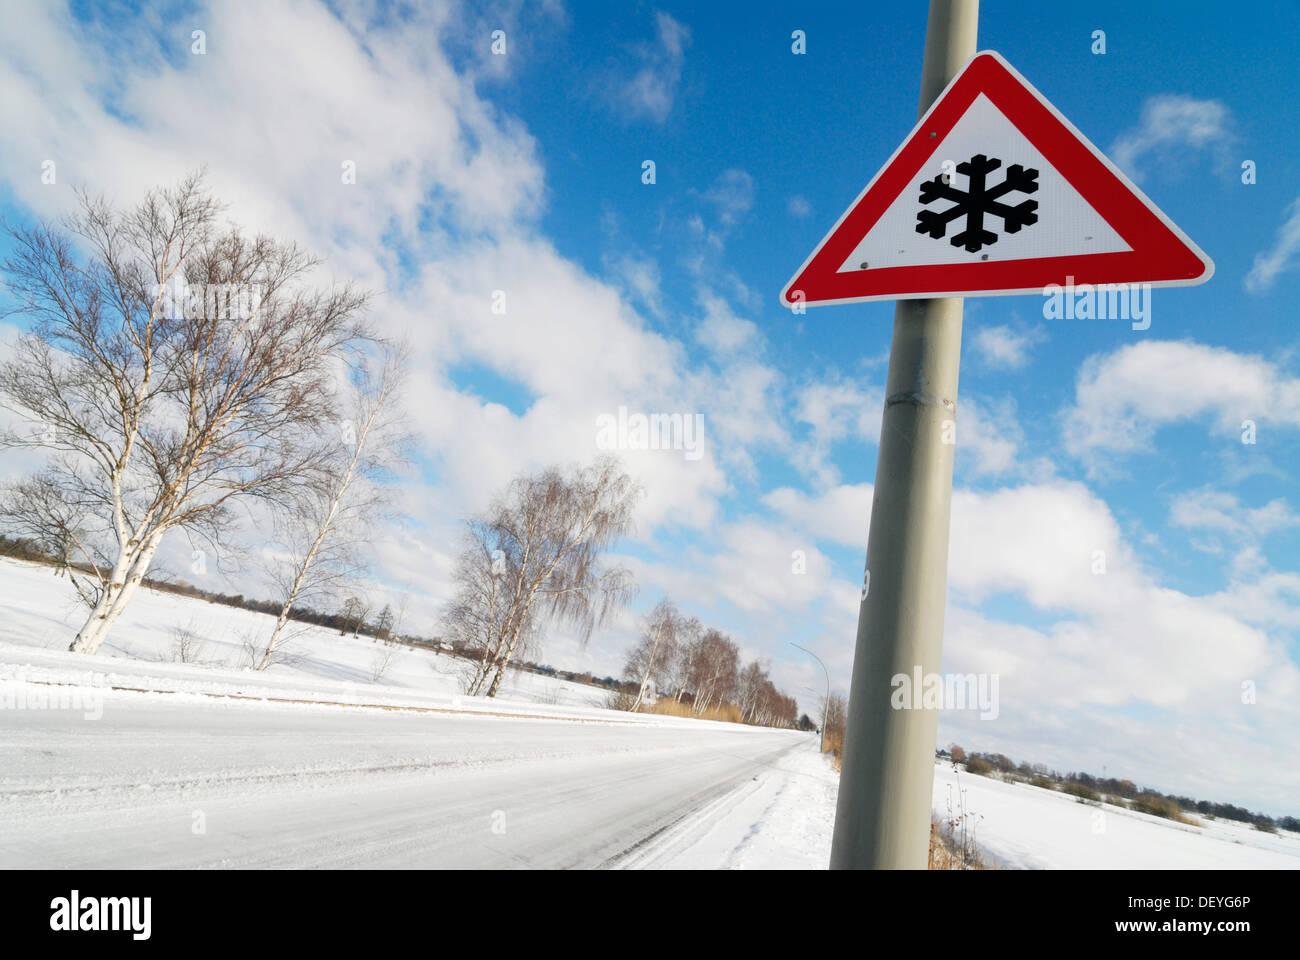 Winter road, slippery roads - Stock Image